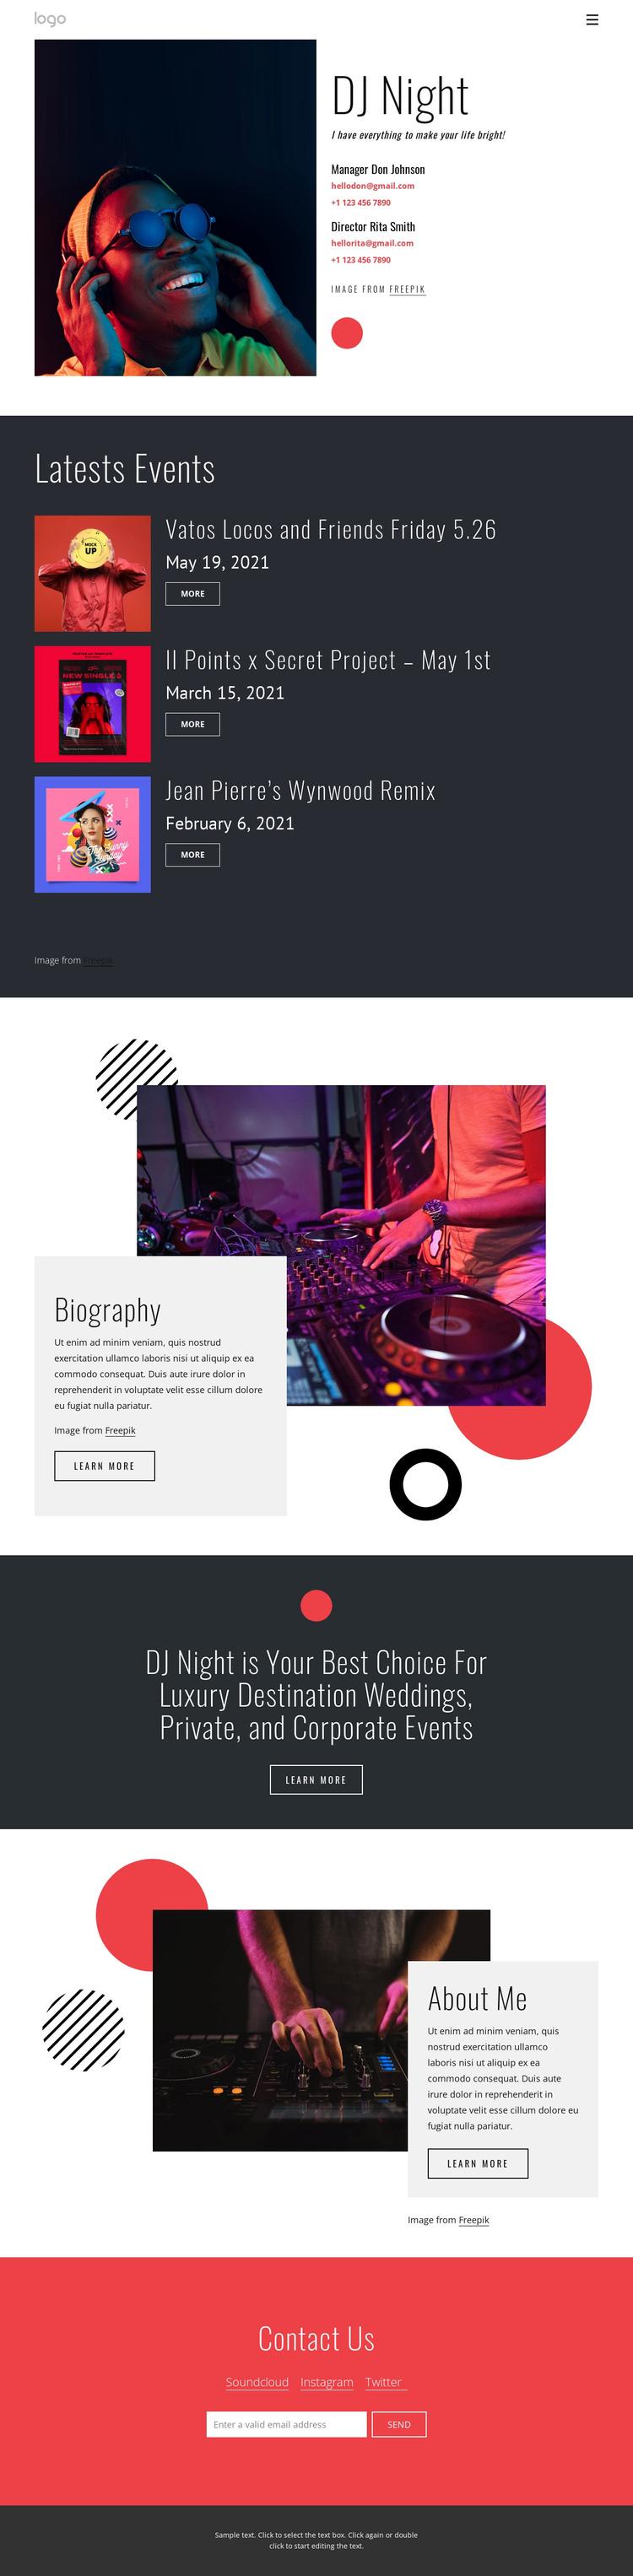 Dj night website Website Builder Software